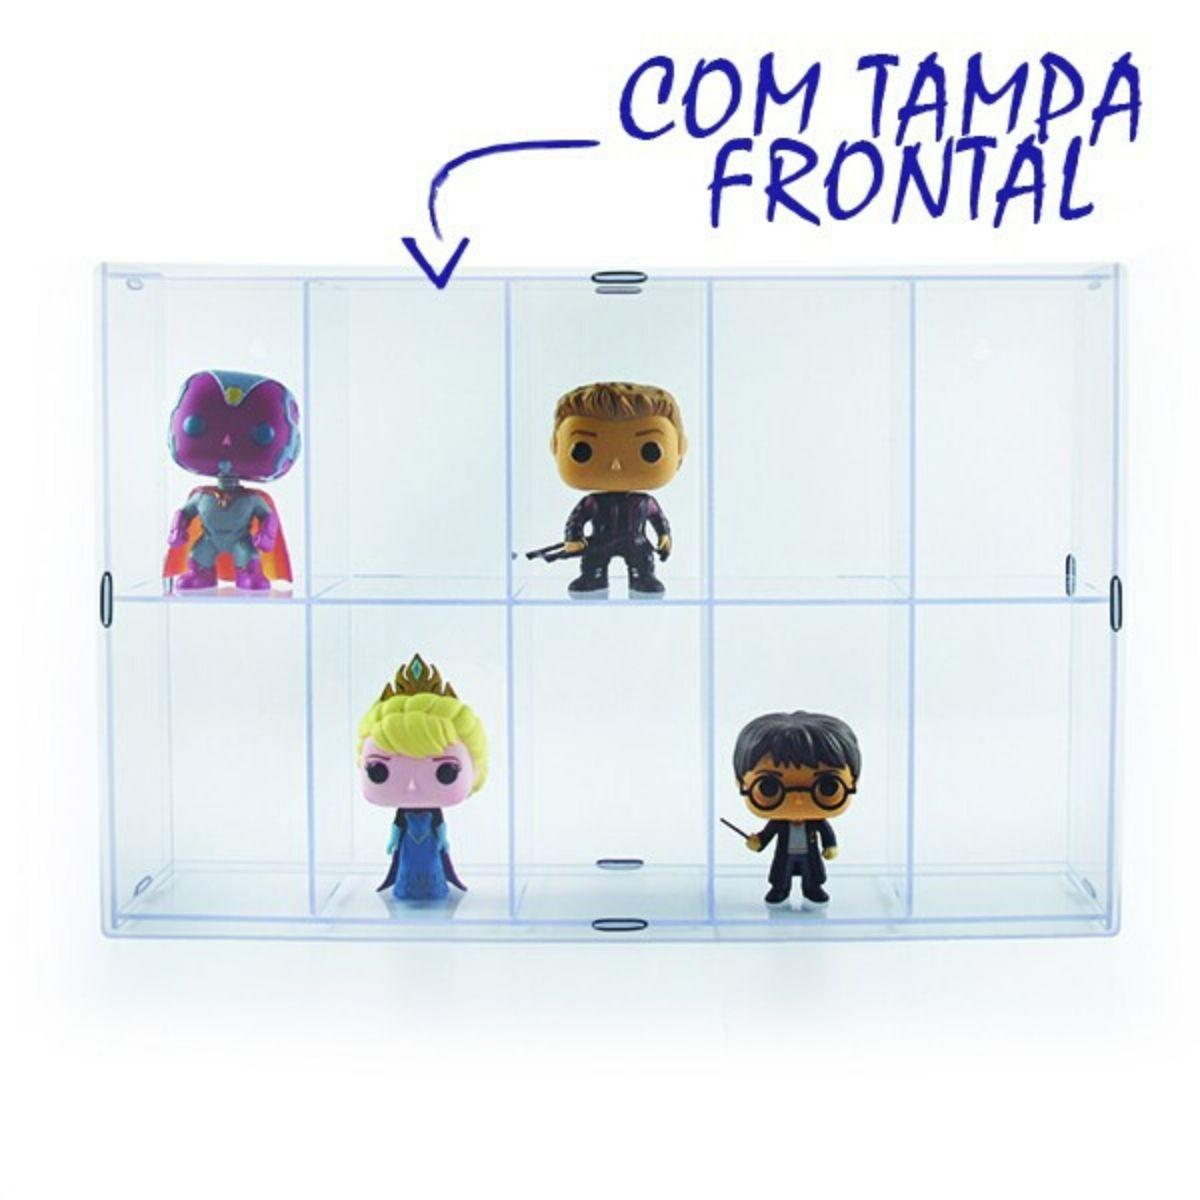 Expositor para Funko - 10 Nichos - Com Tampa  - Game Land Brinquedos